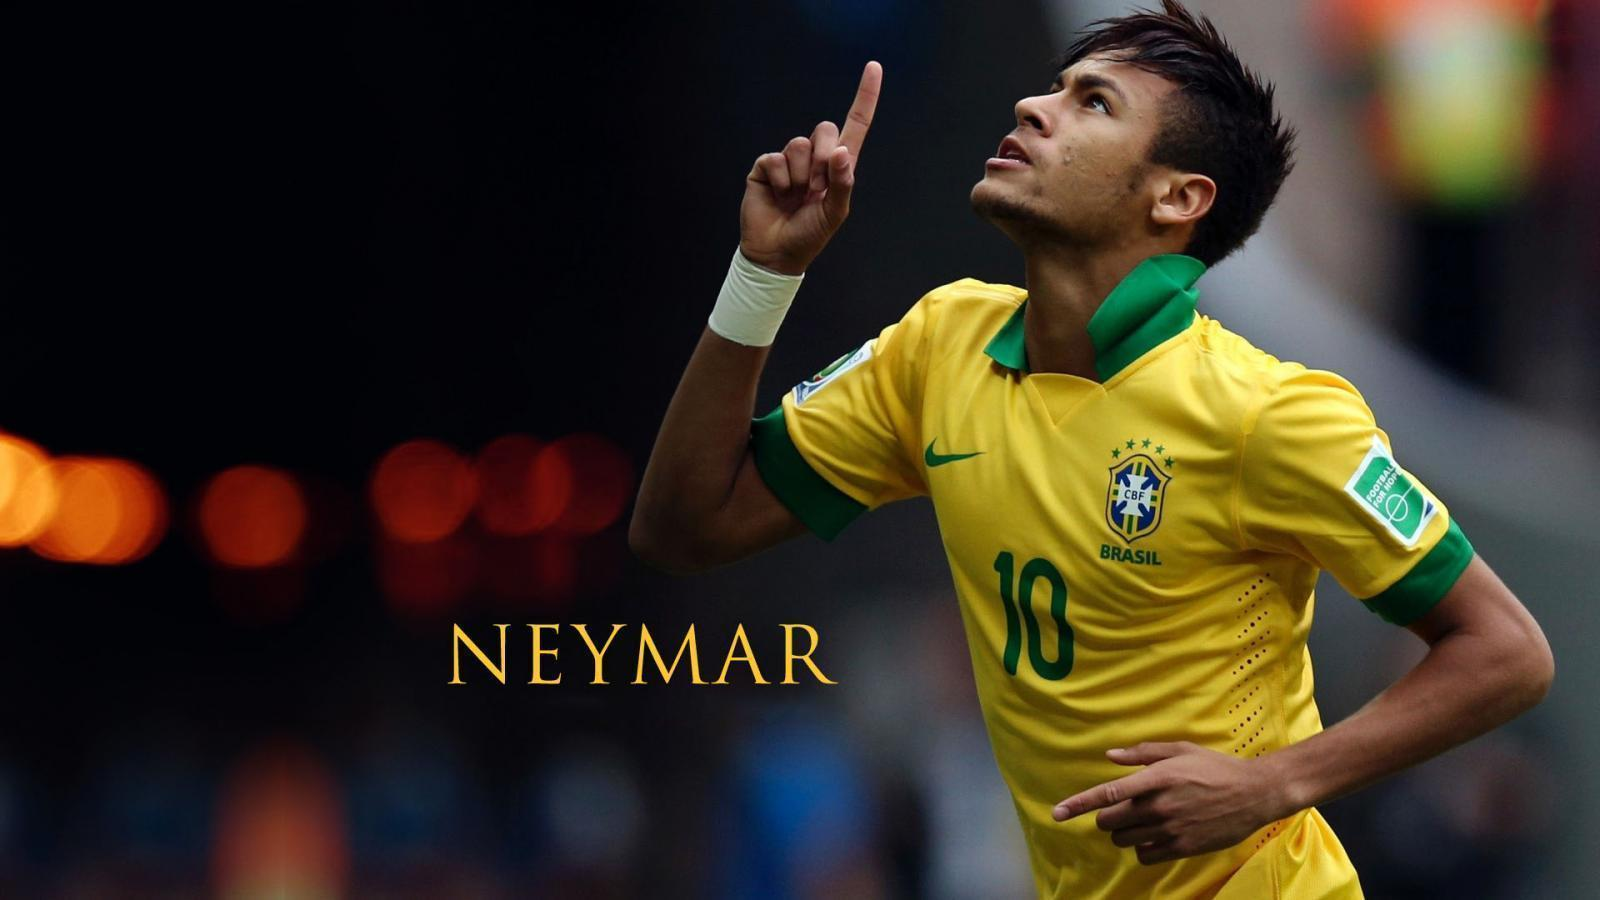 neymar backgrounds brazil flag 2016 wallpaper cave